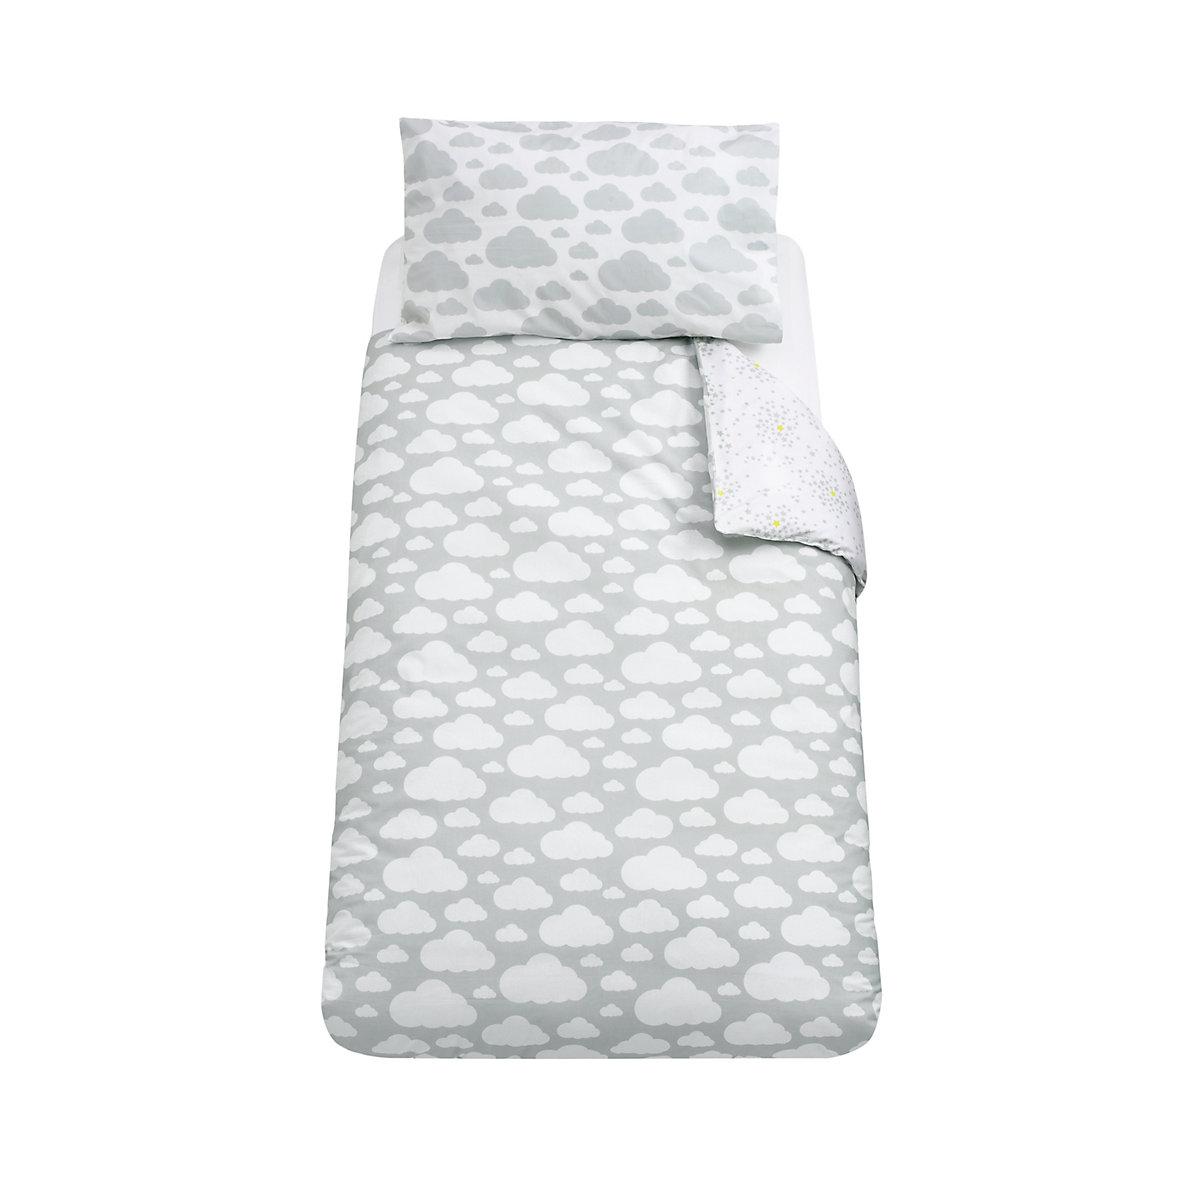 Baby K Cot Bed Duvet and Pillowcase Set